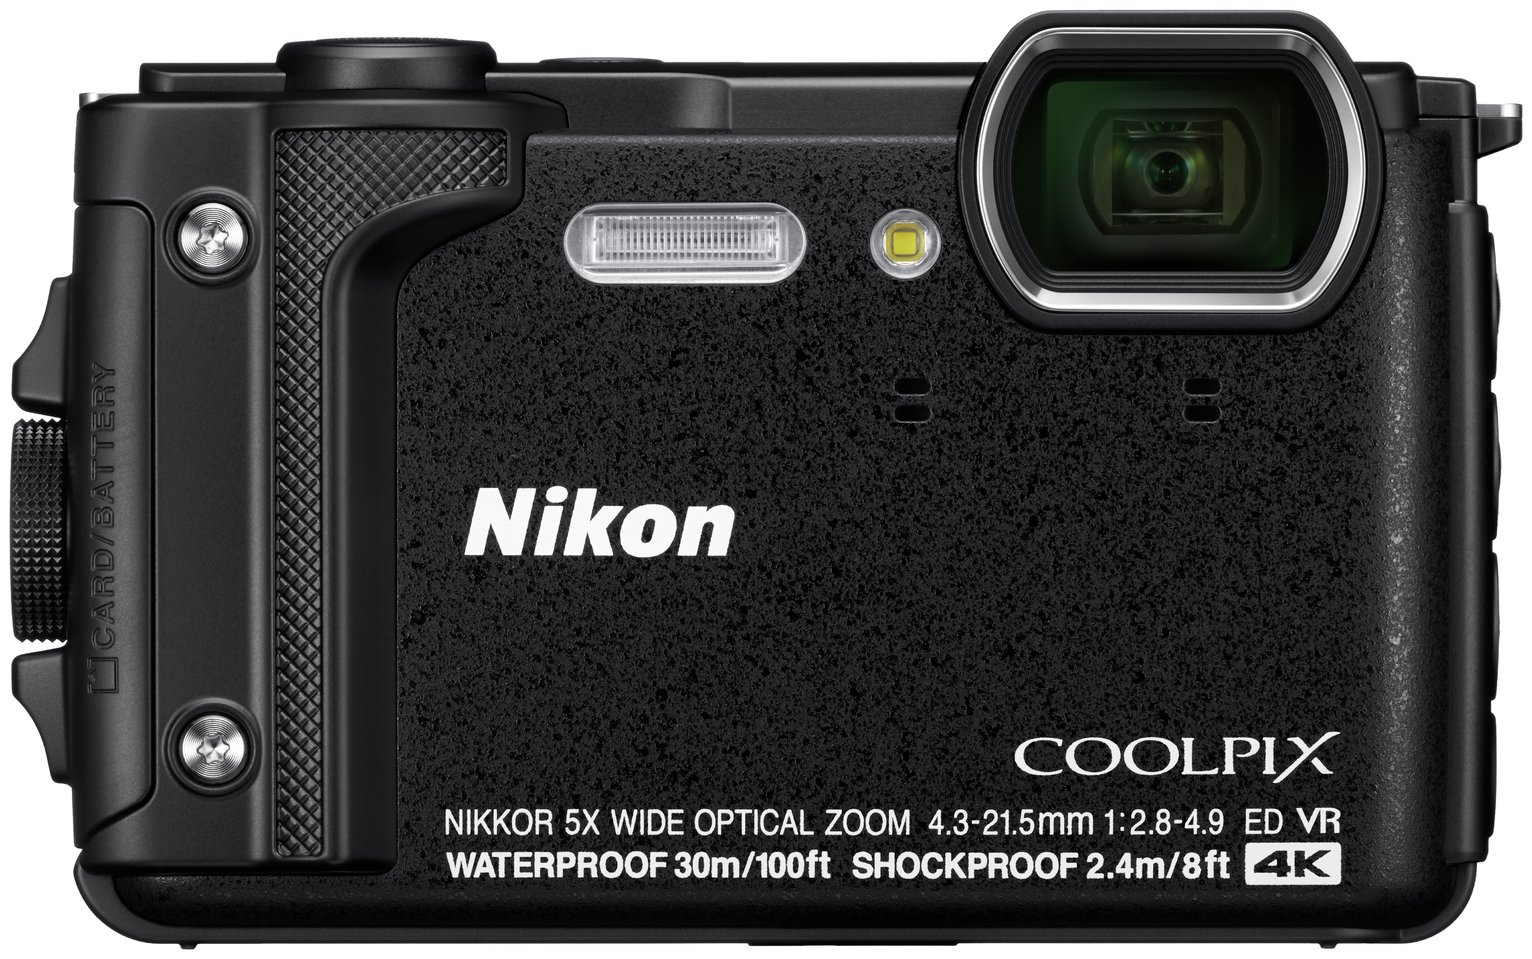 Nikon Coolpix W300 16MP 5x Zoom Compact Camera - Black